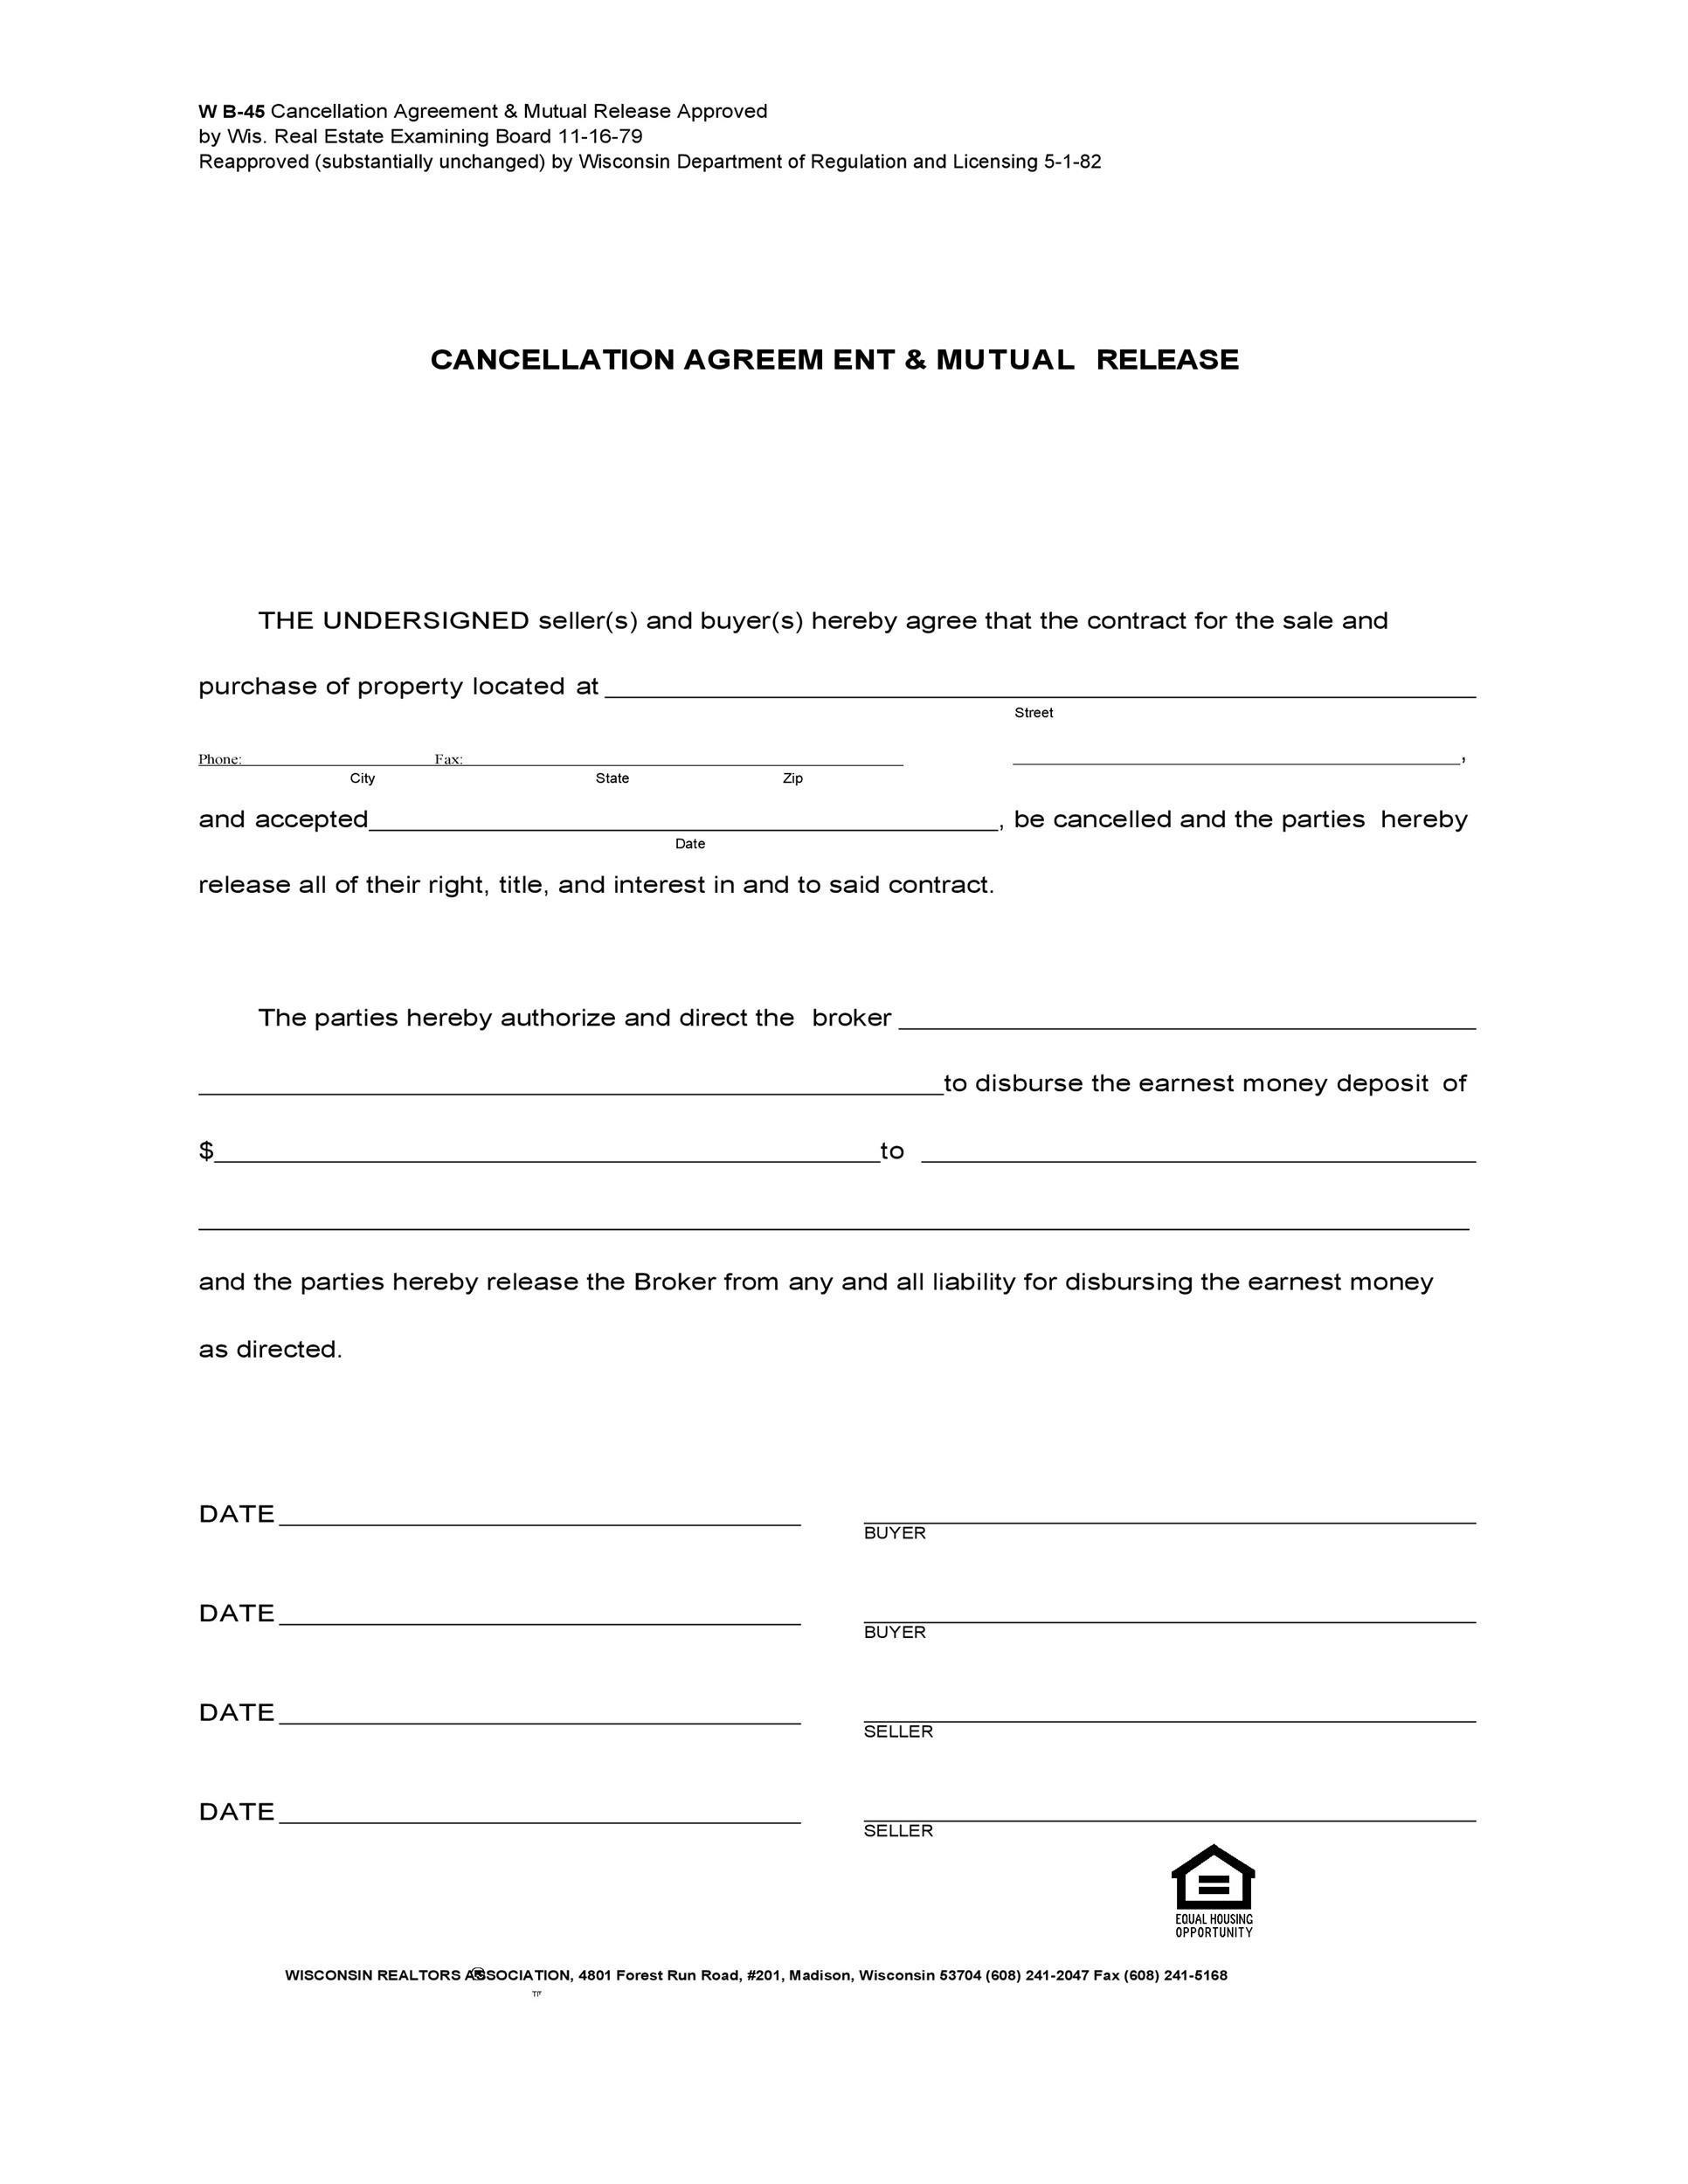 Free rescission agreement 45